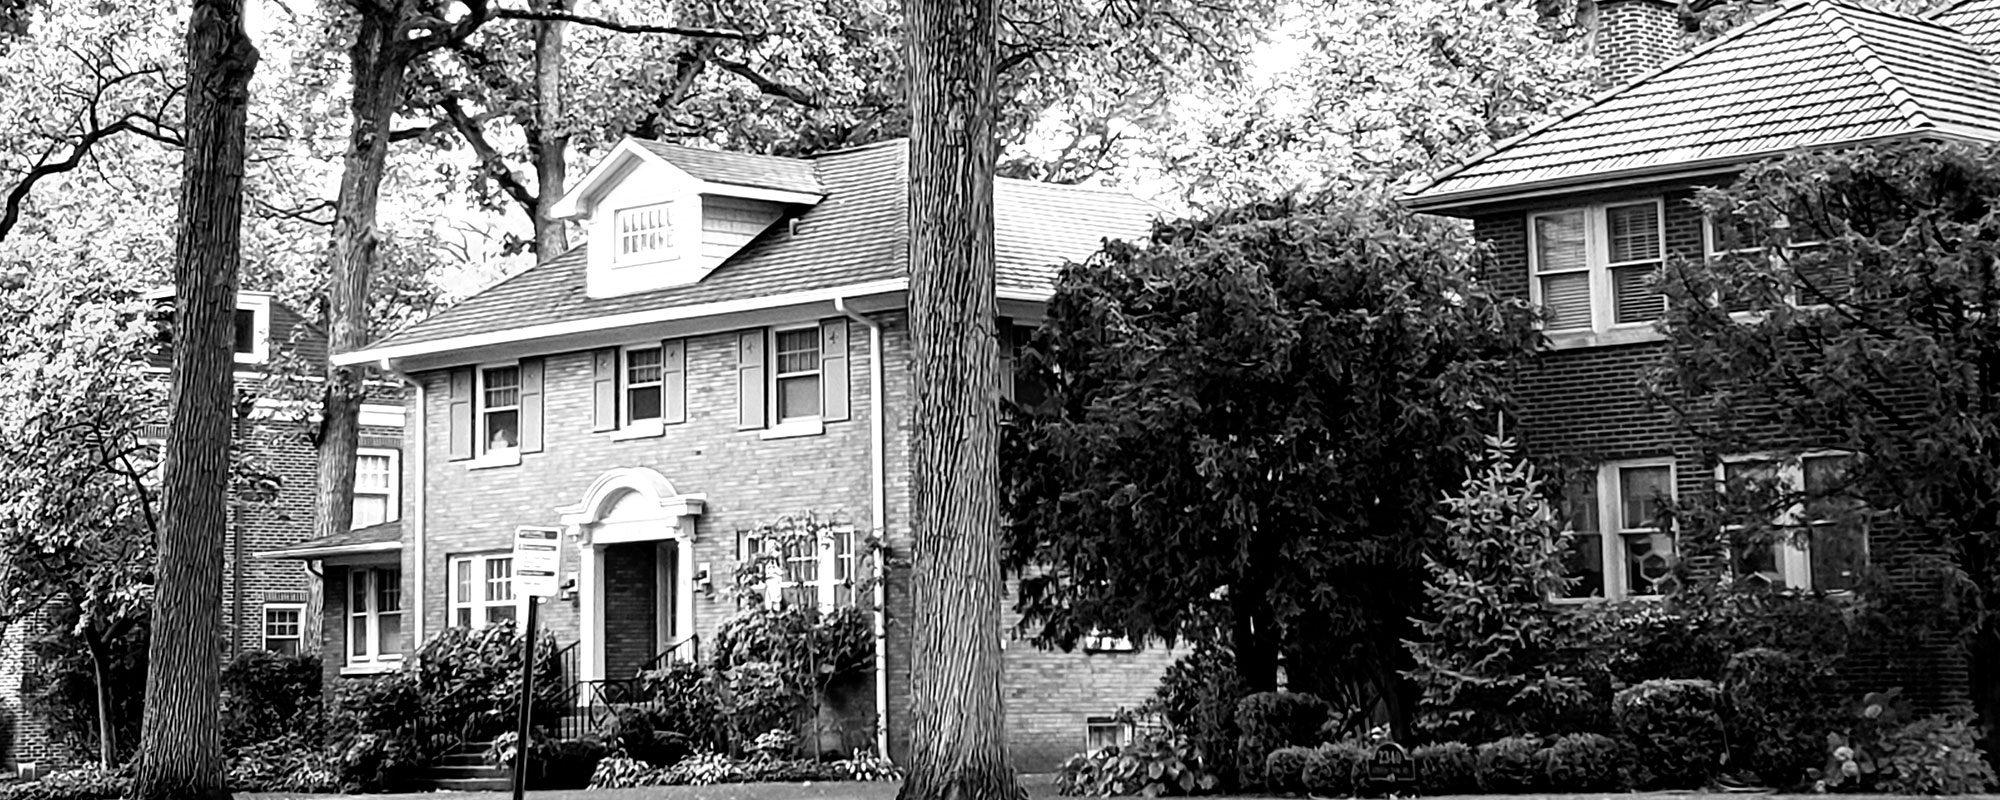 Black and White Photo of a Nice Neighborhood